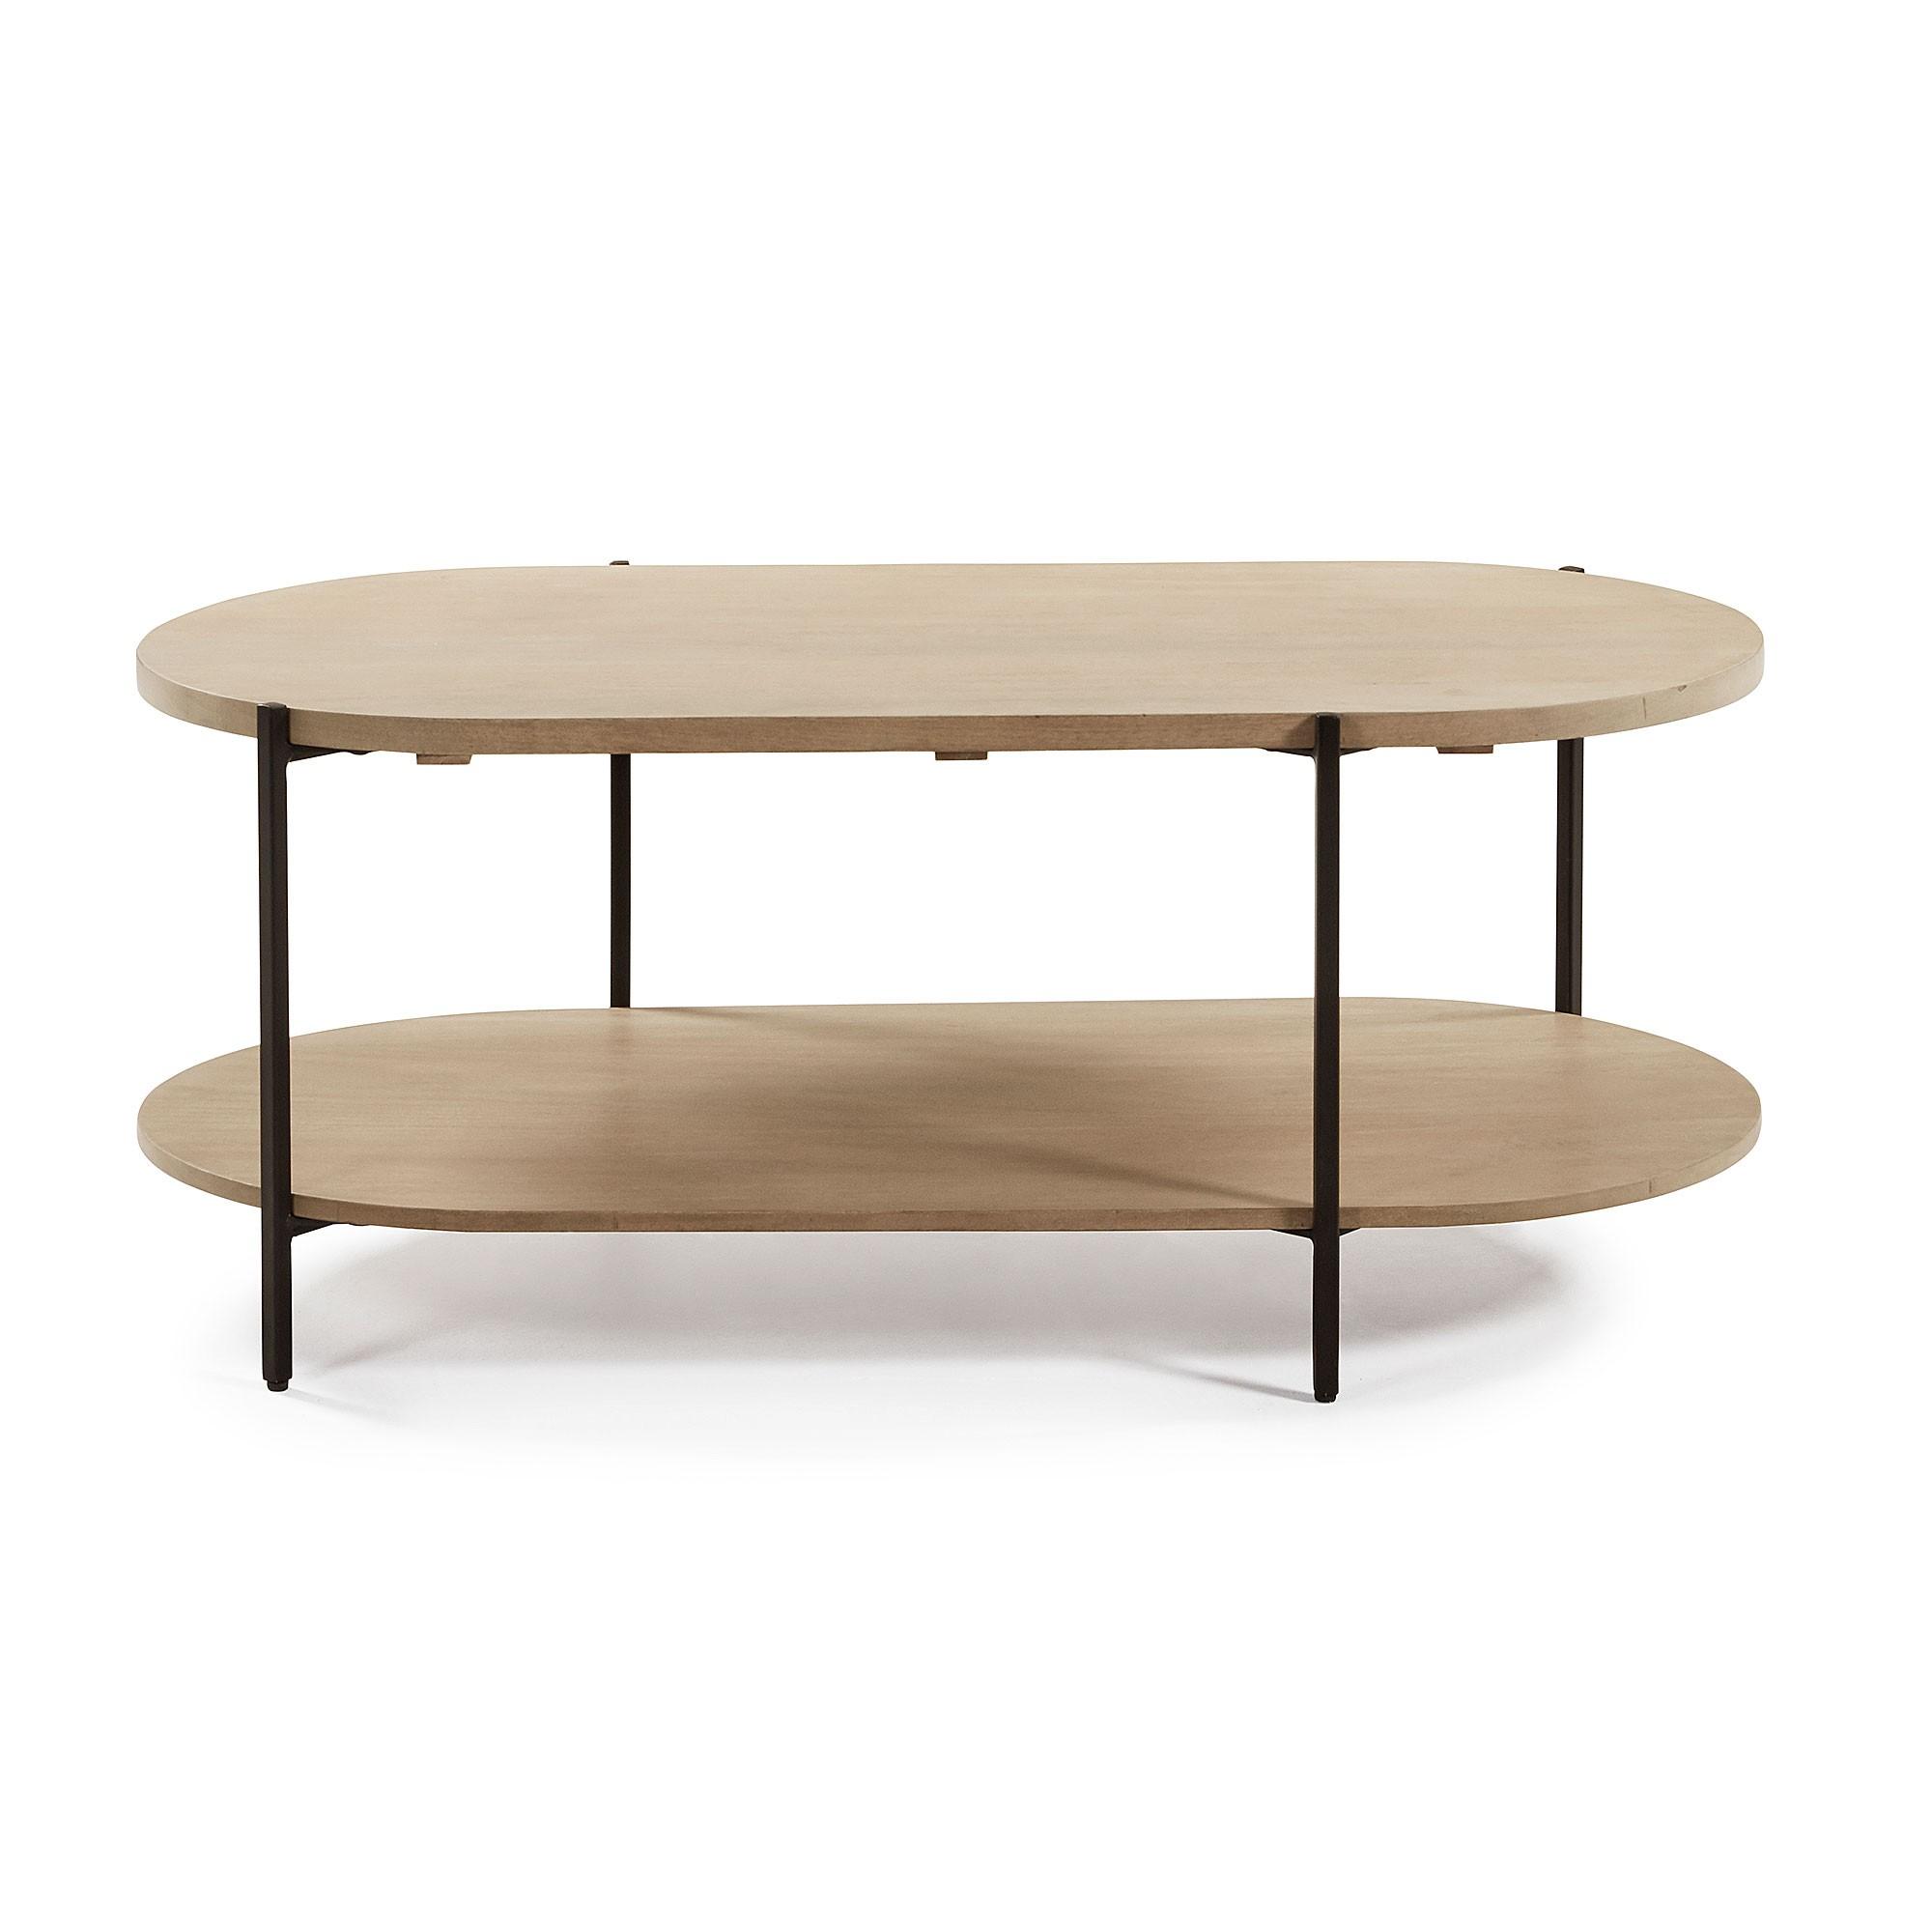 Aparador Mango Wood & Iron Oval Coffee Table, 110cm